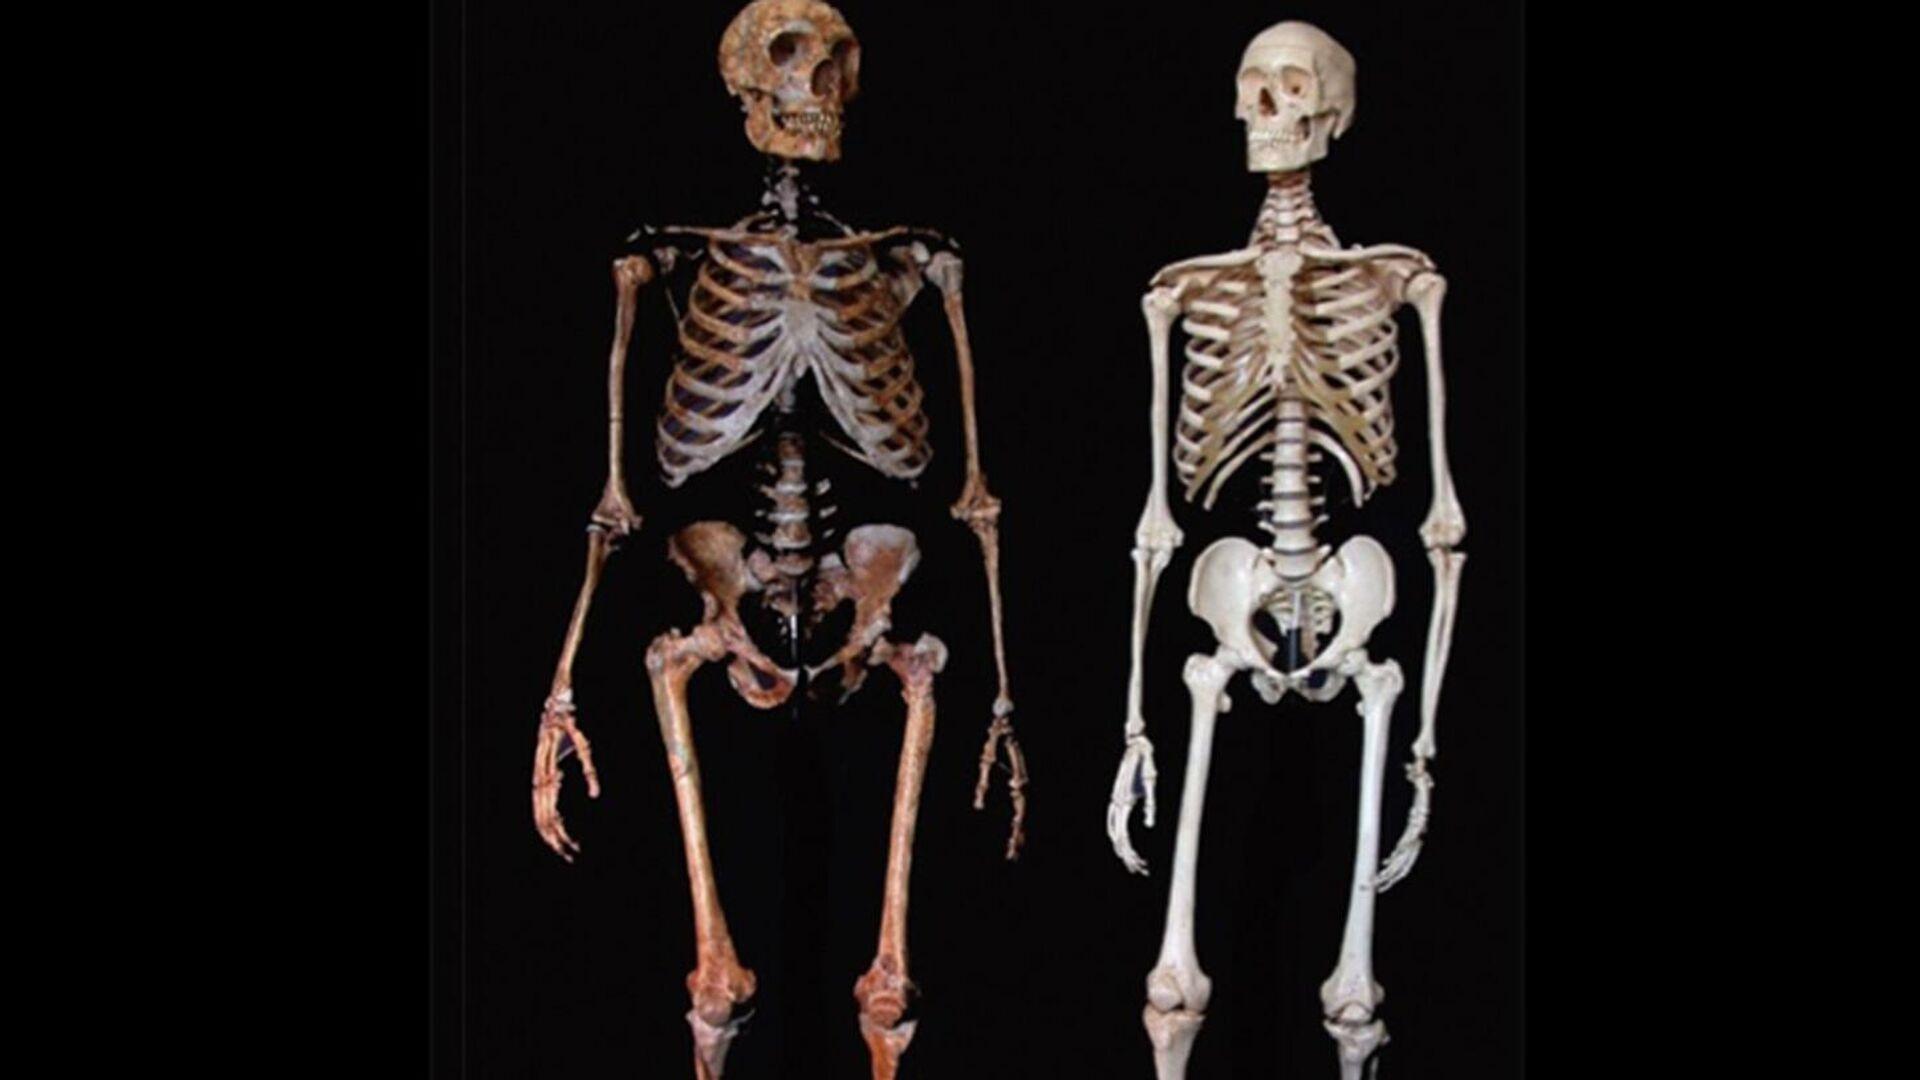 Comparativa de Neandertal y Homo Sapiens - Sputnik Mundo, 1920, 22.04.2021